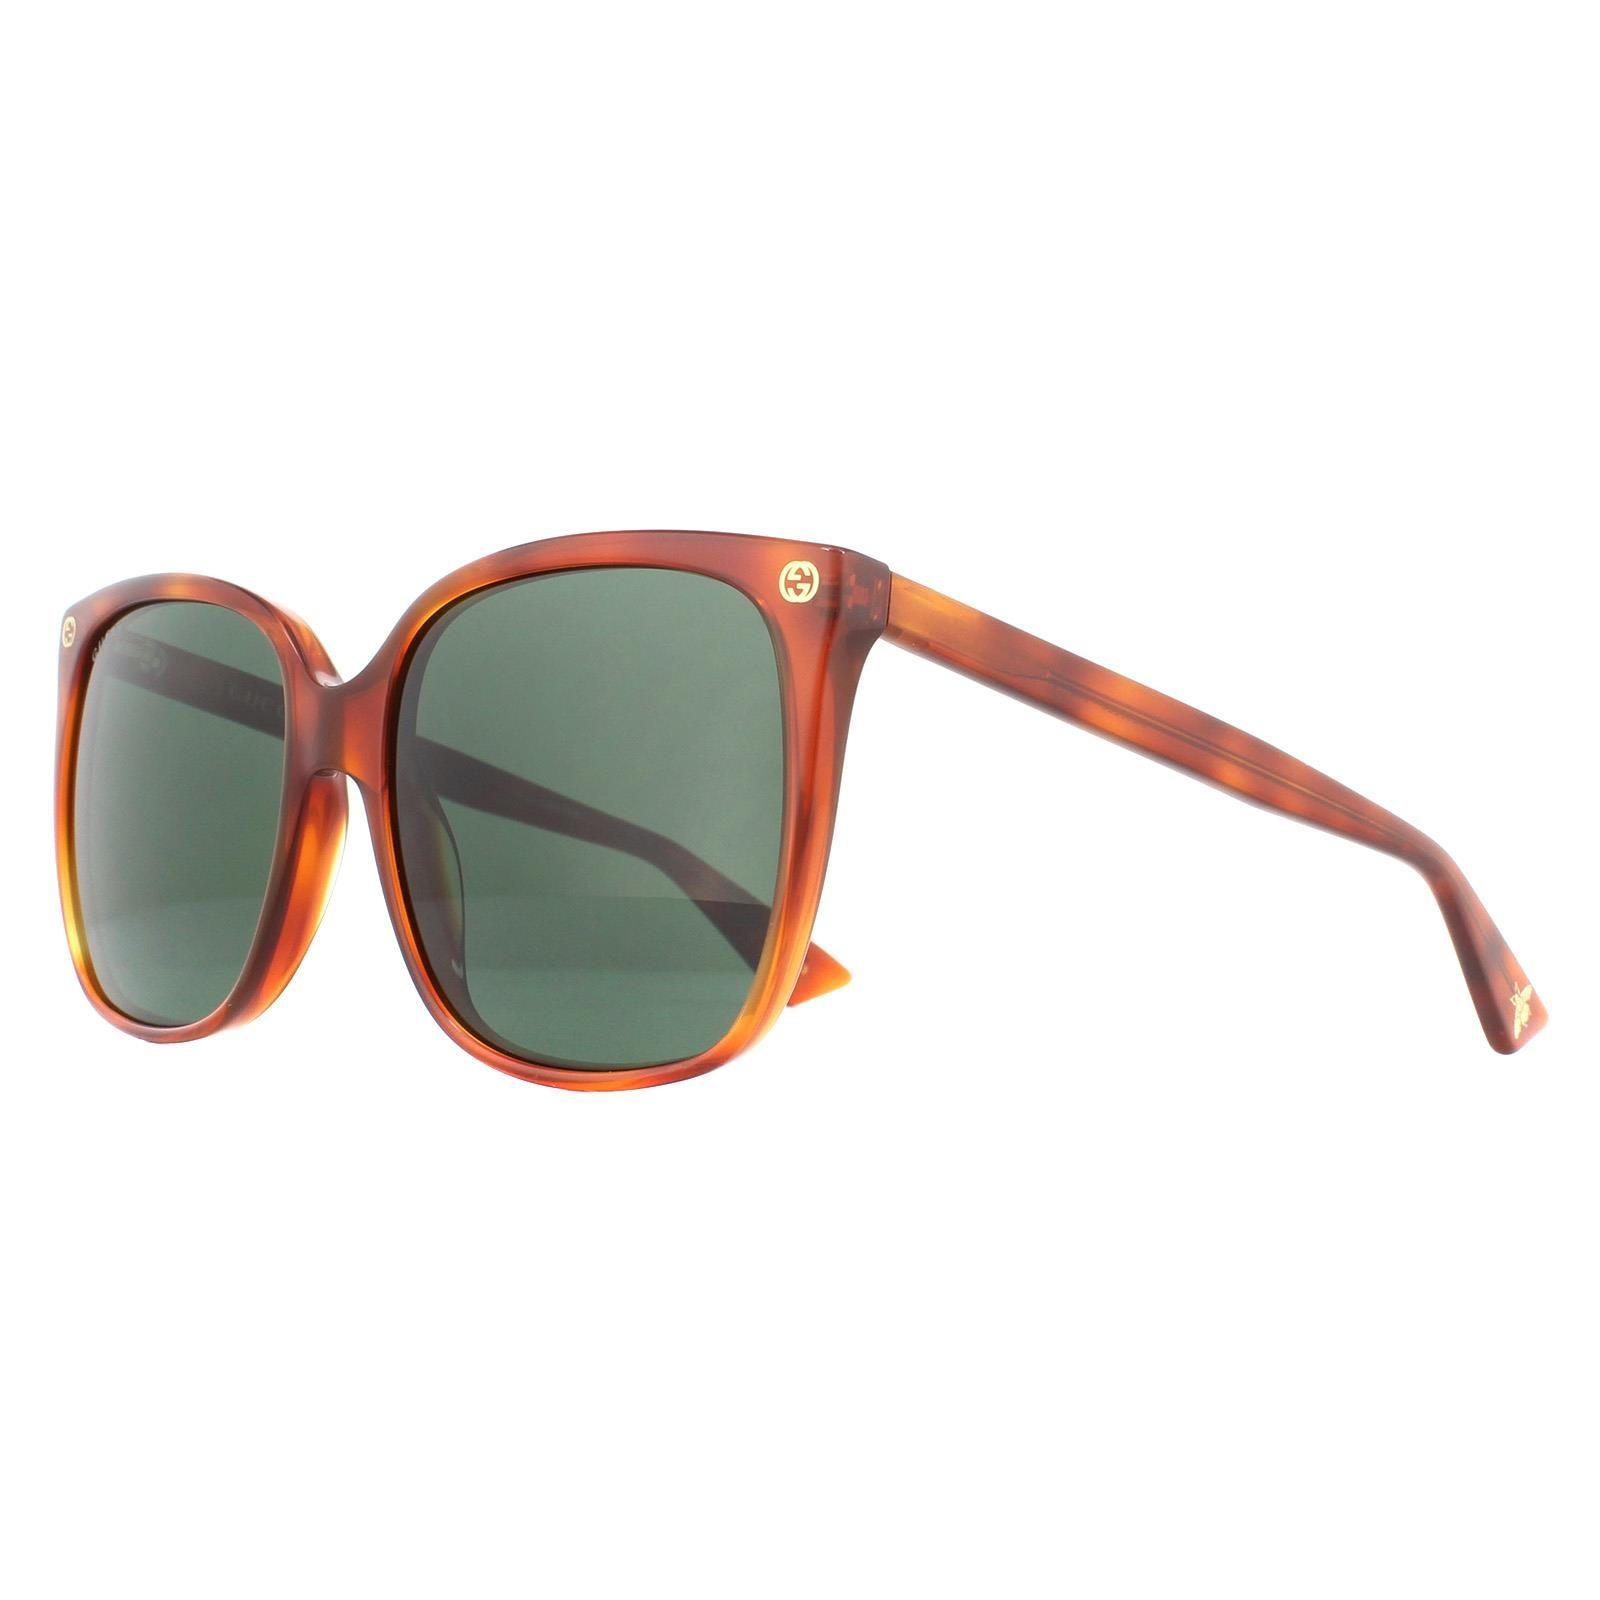 Gucci Sunglasses GG0022S 002 Havana Green